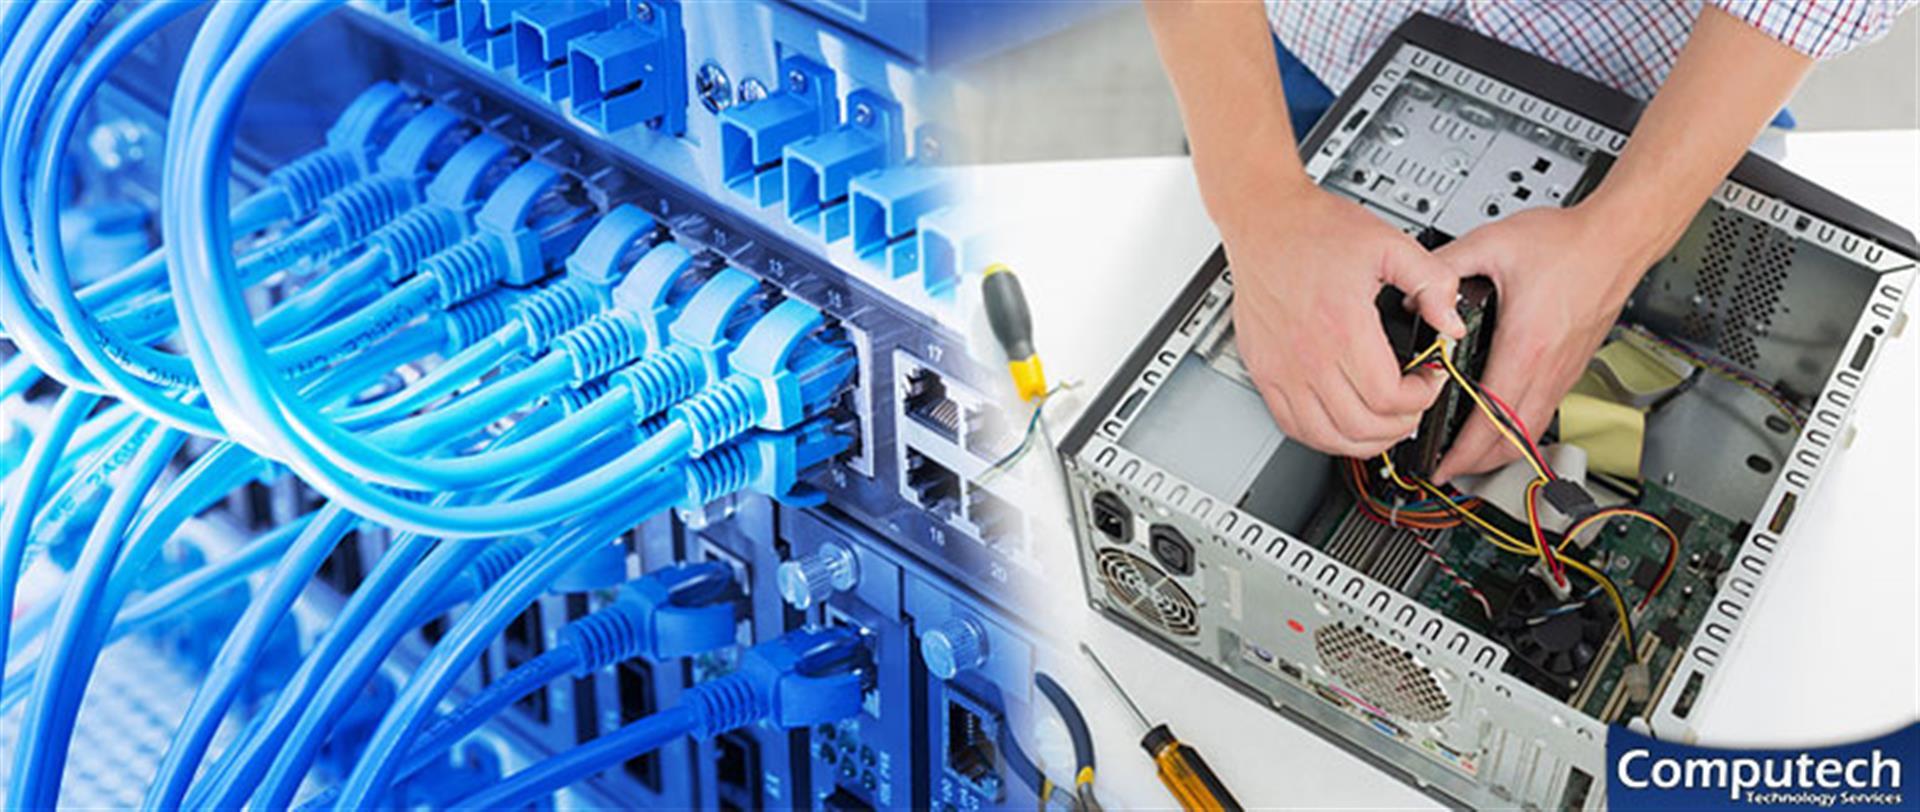 Camilla Georgia On Site Computer & Printer Repair, Networks, Voice & Data Cabling Services